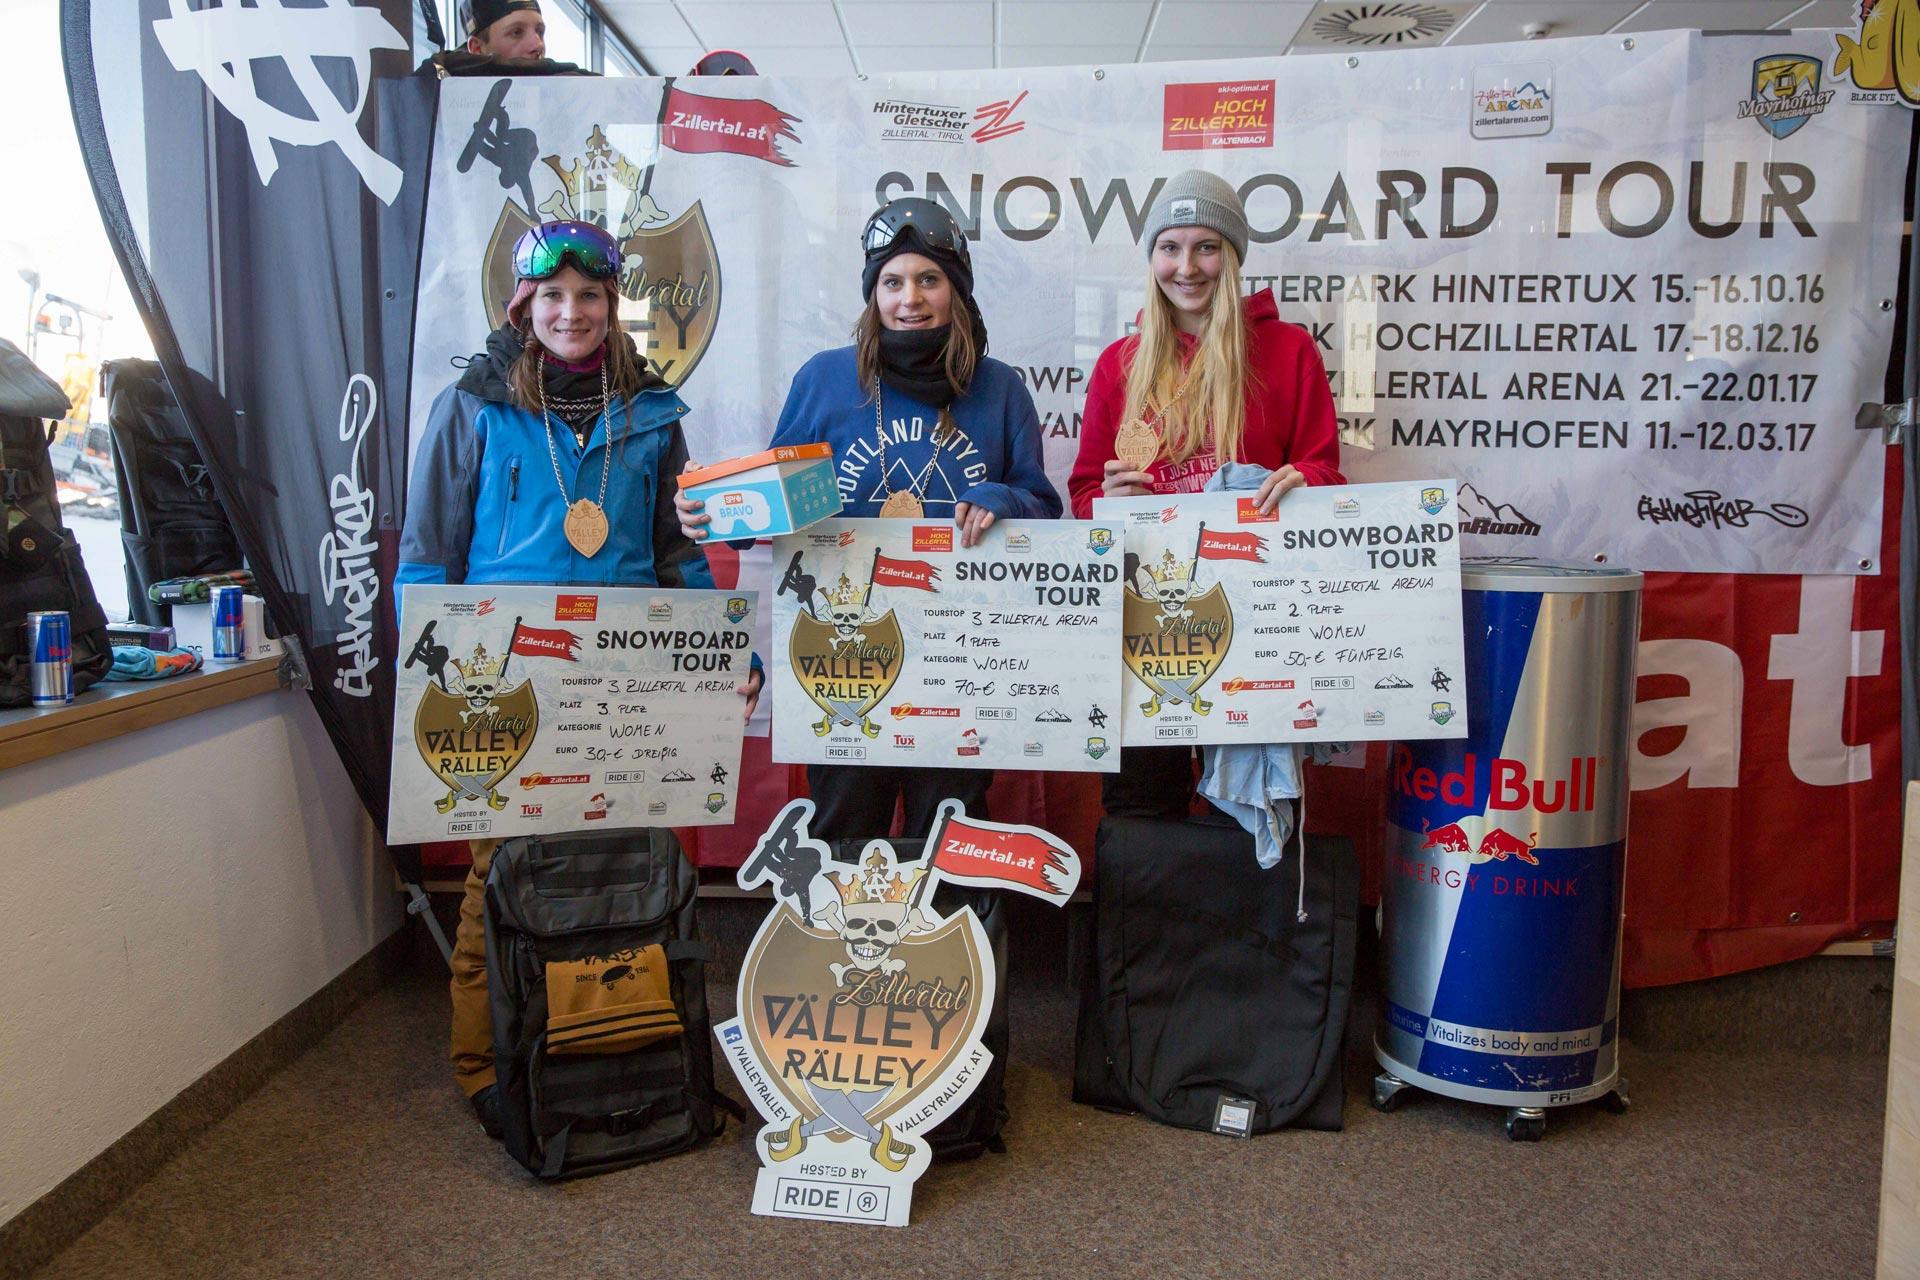 Top 3 Women: Katharina Kasper, Djoelie Ectors, Tereza Sebkova